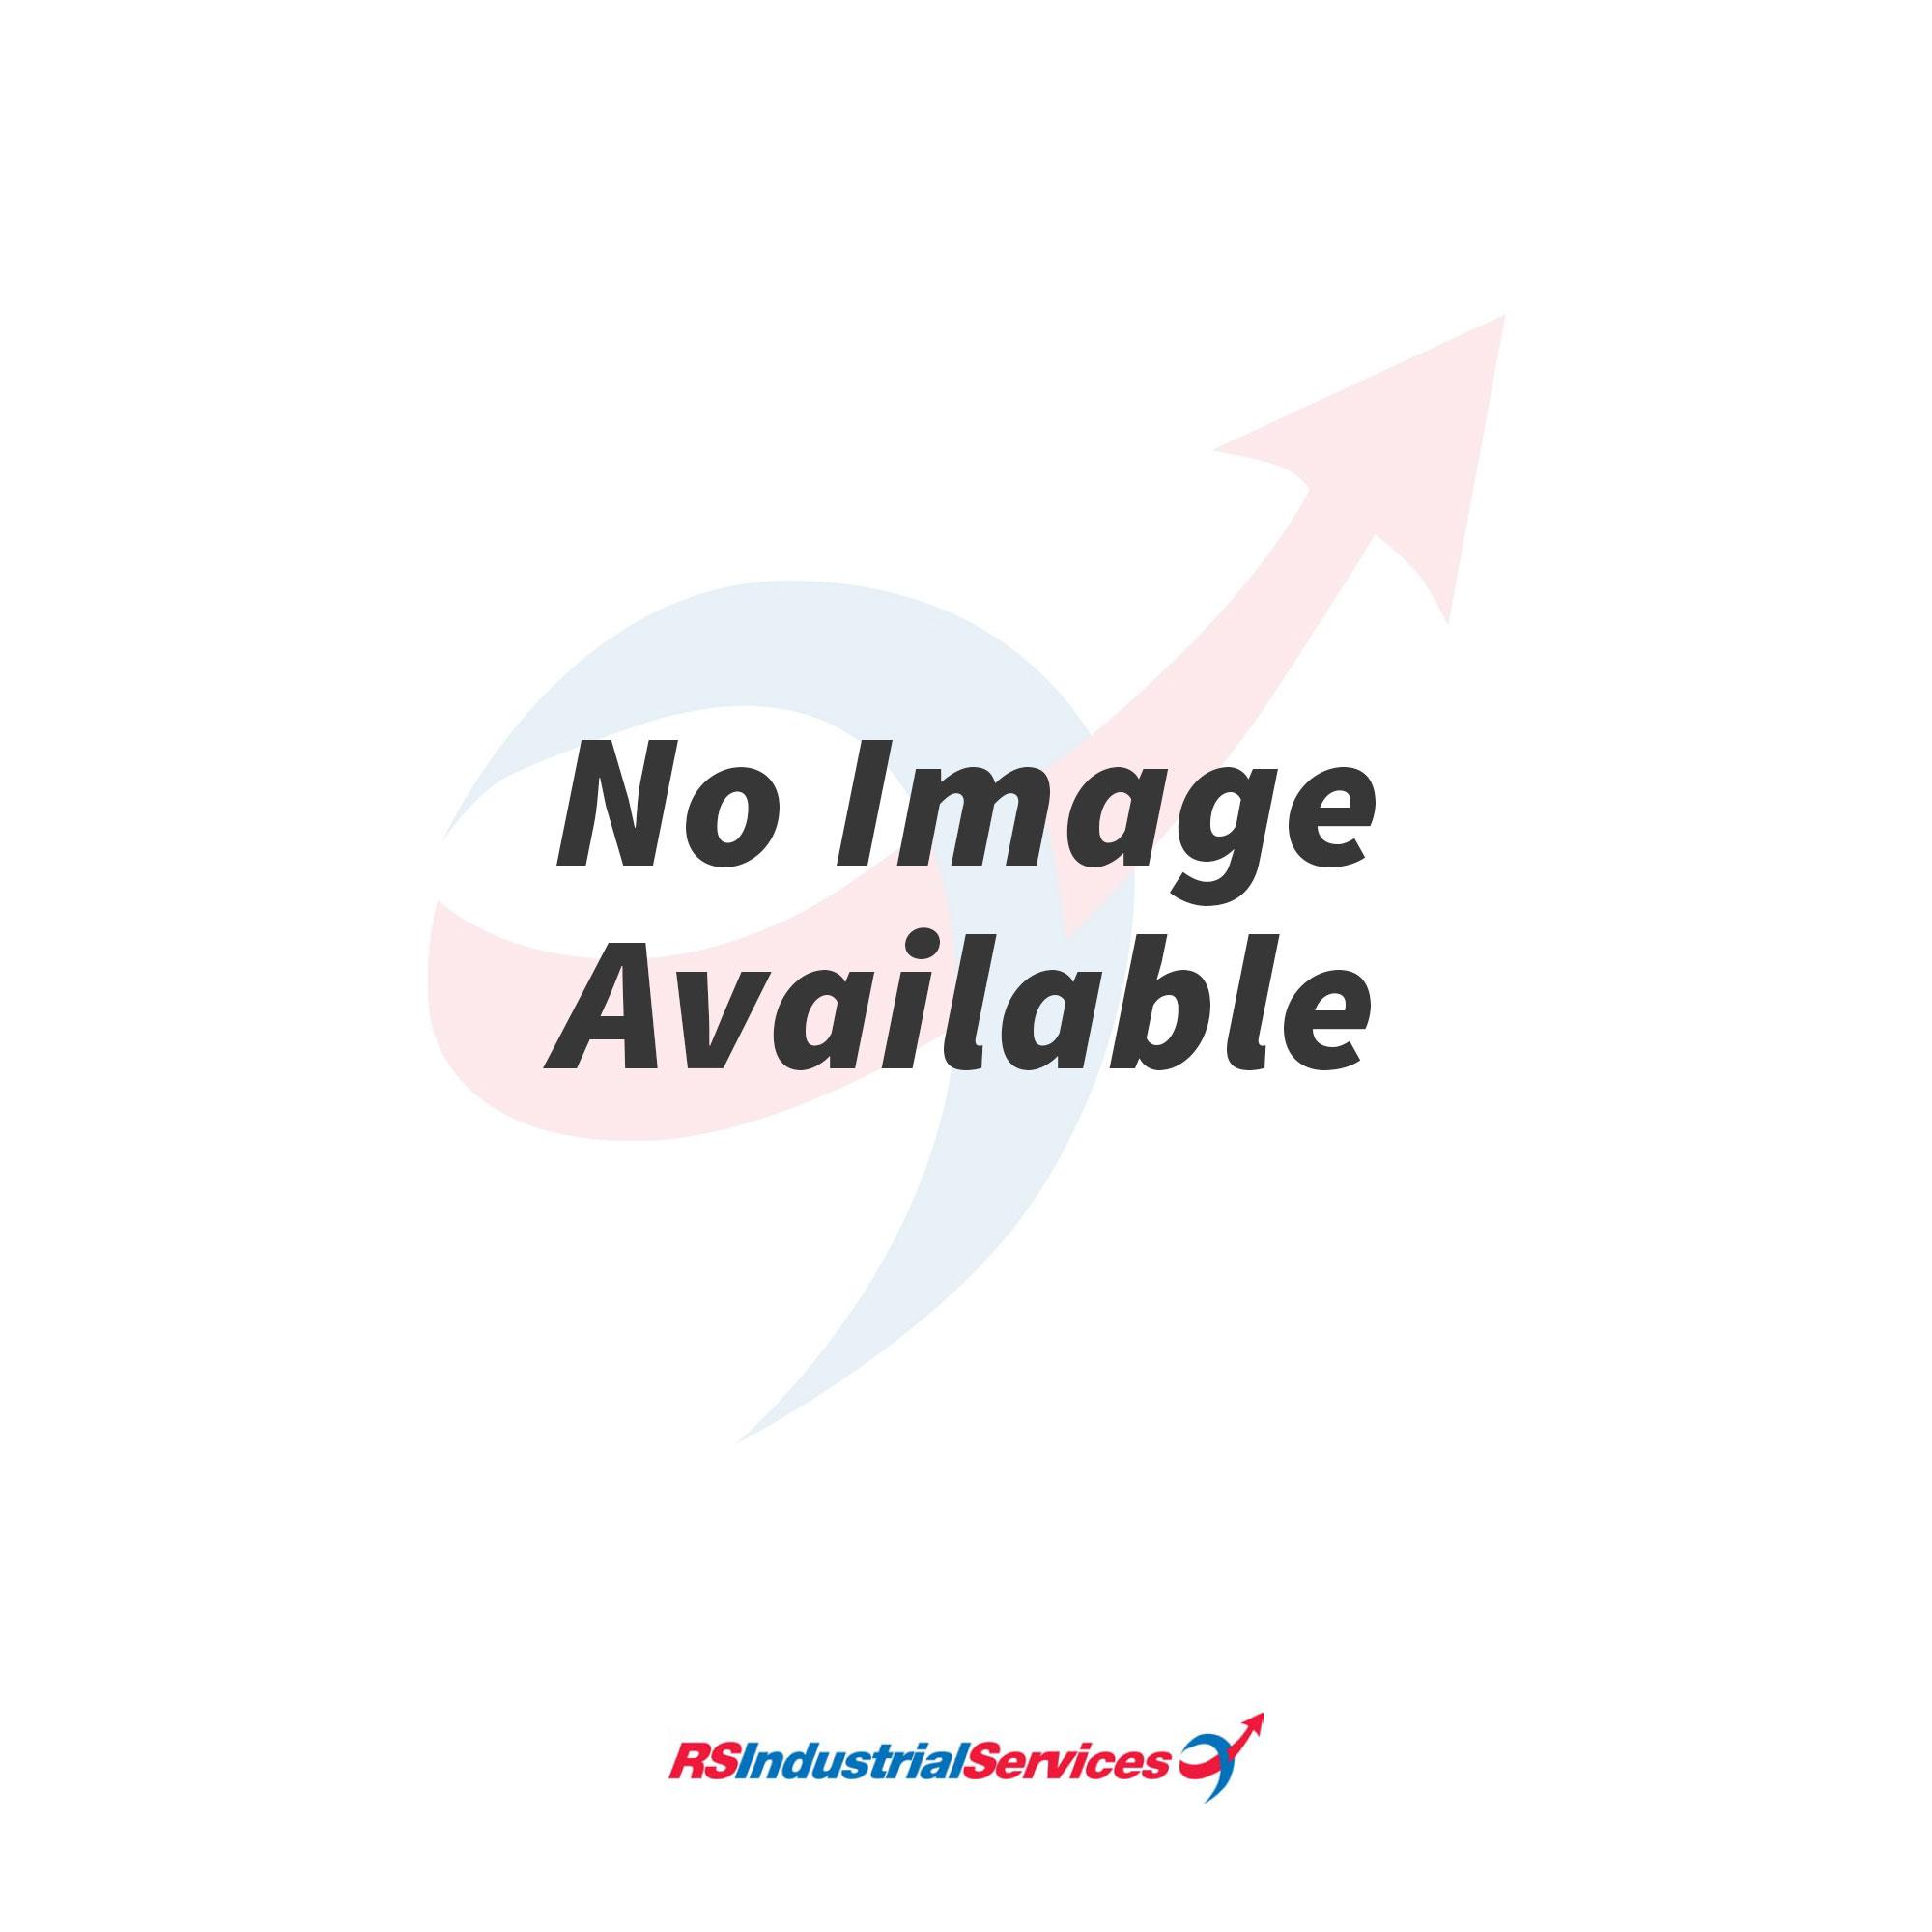 Rawl Bolt R-RBP-M08/25W (44560) Shield Anchor Proj Bolt (Pack of 50)